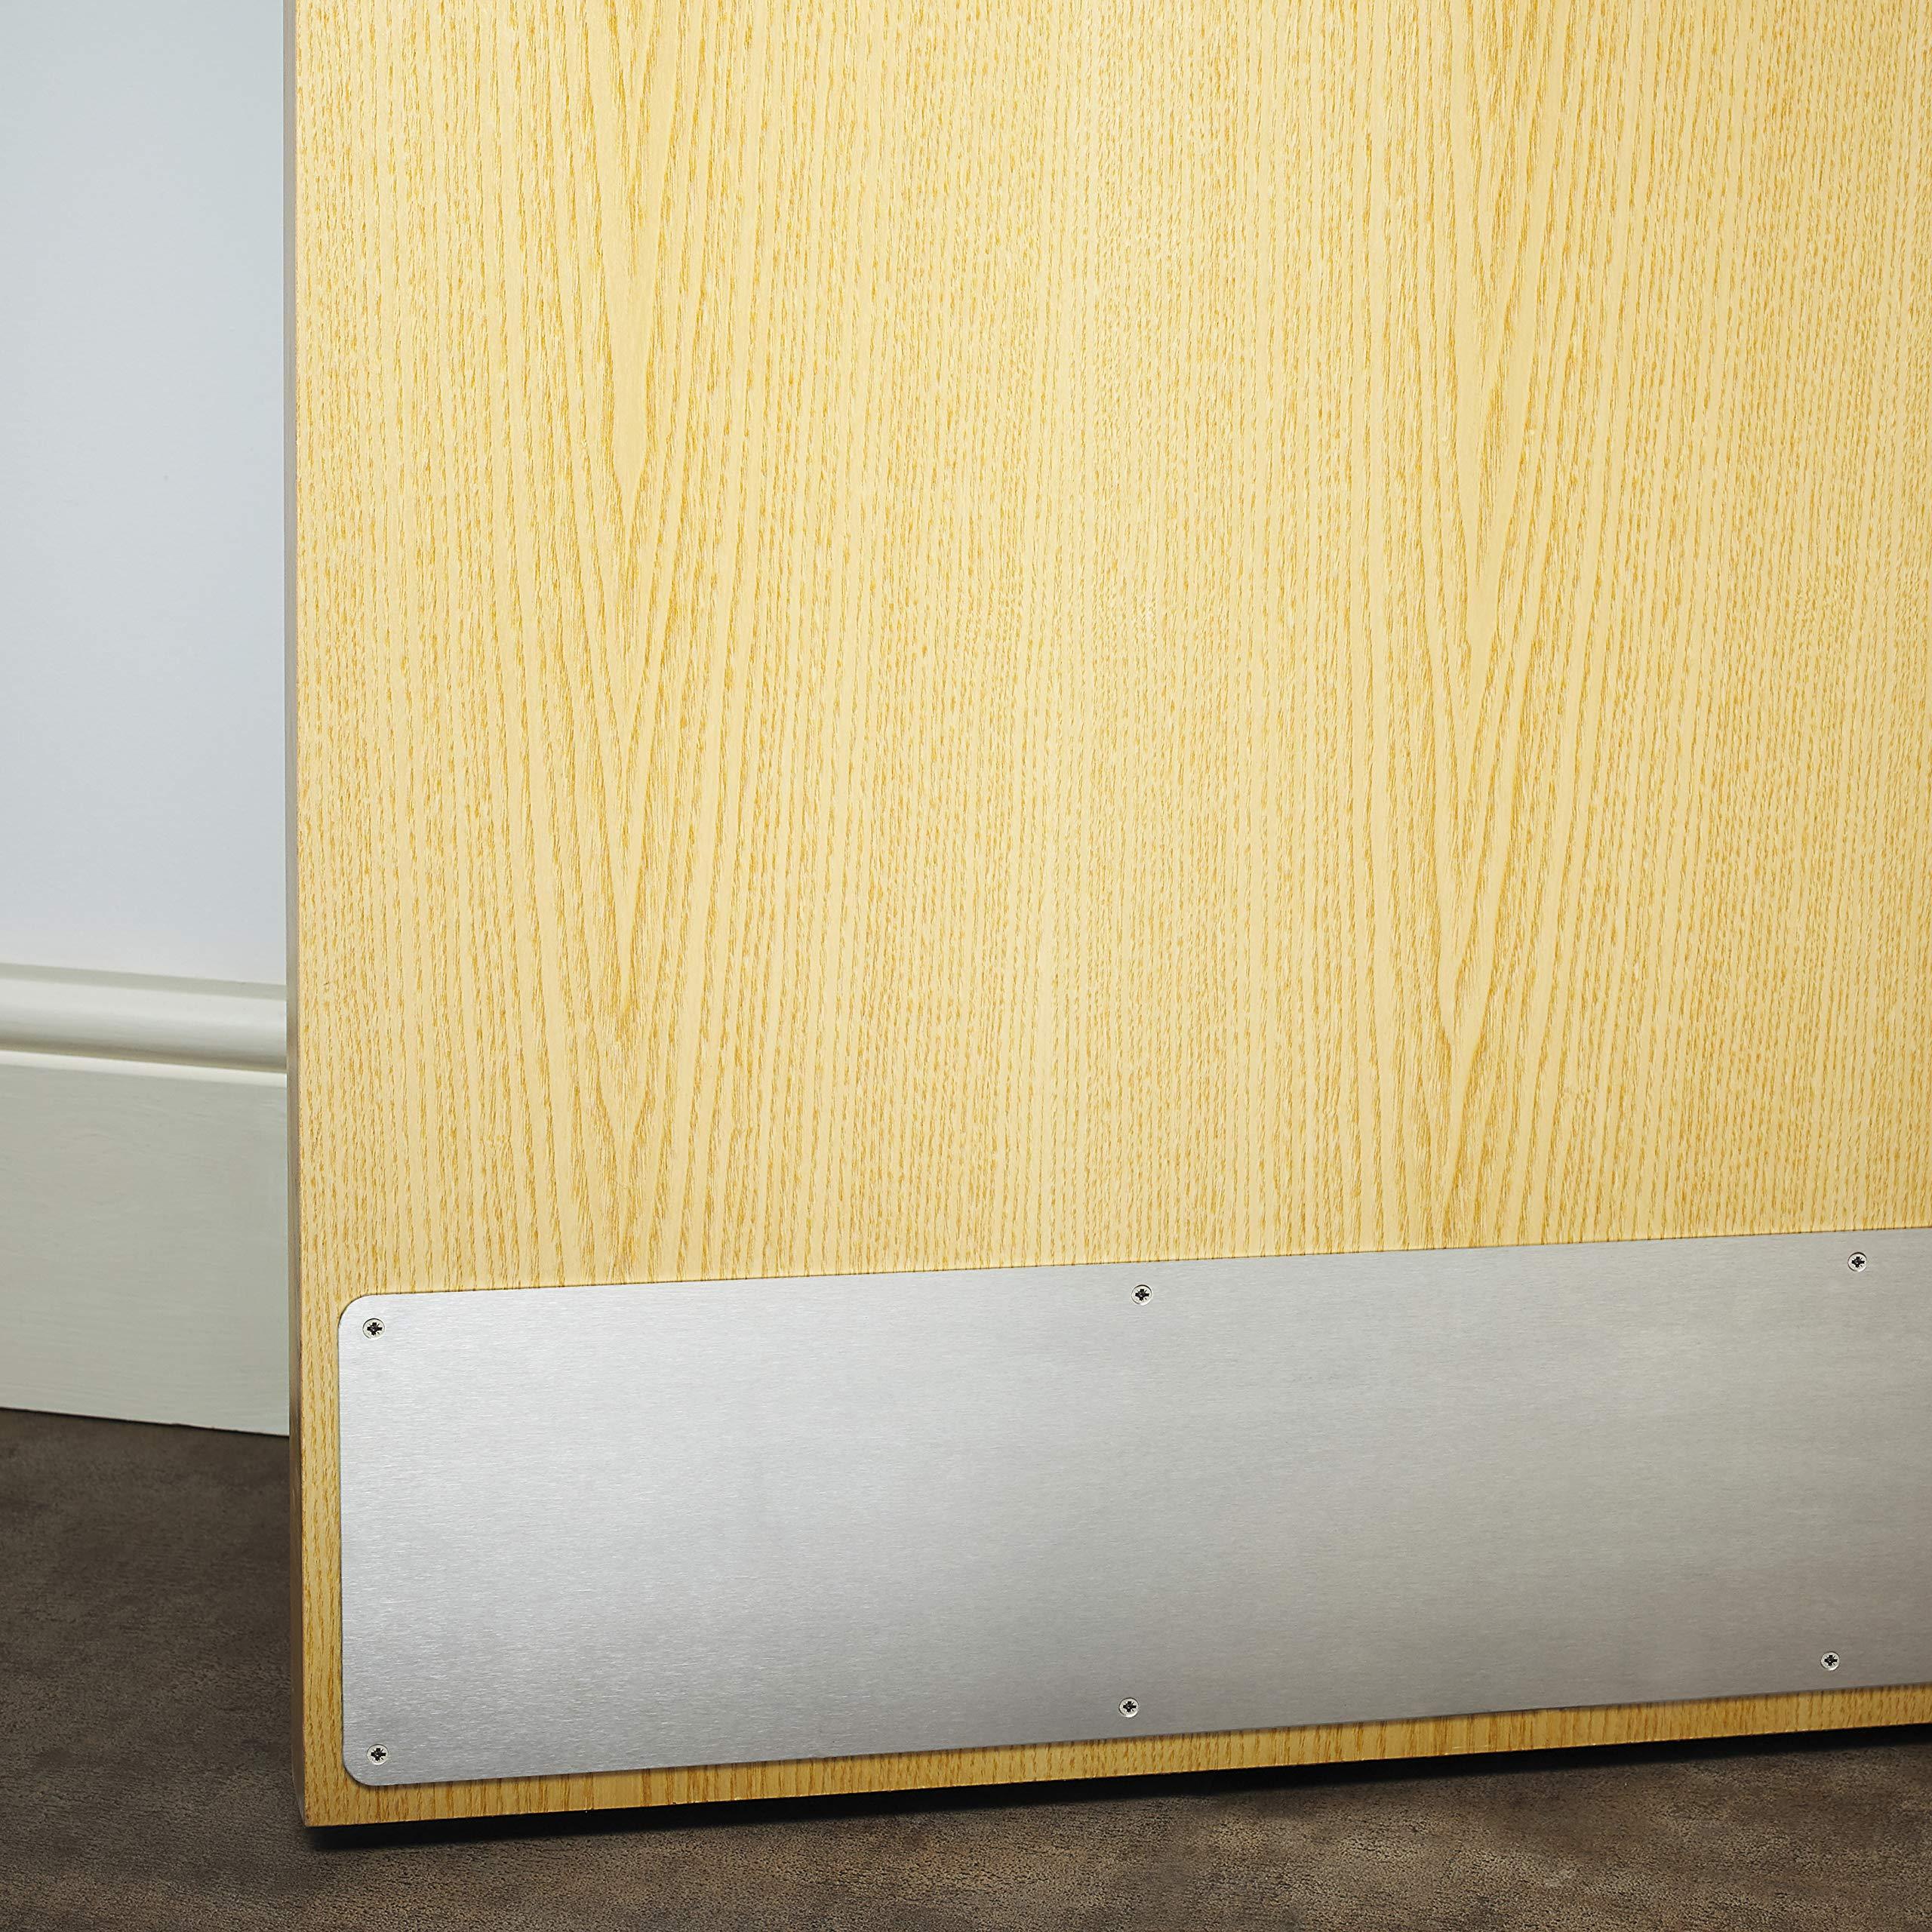 Satin Aluminium Kick Plate 32 x 6 Bottom Door Protection